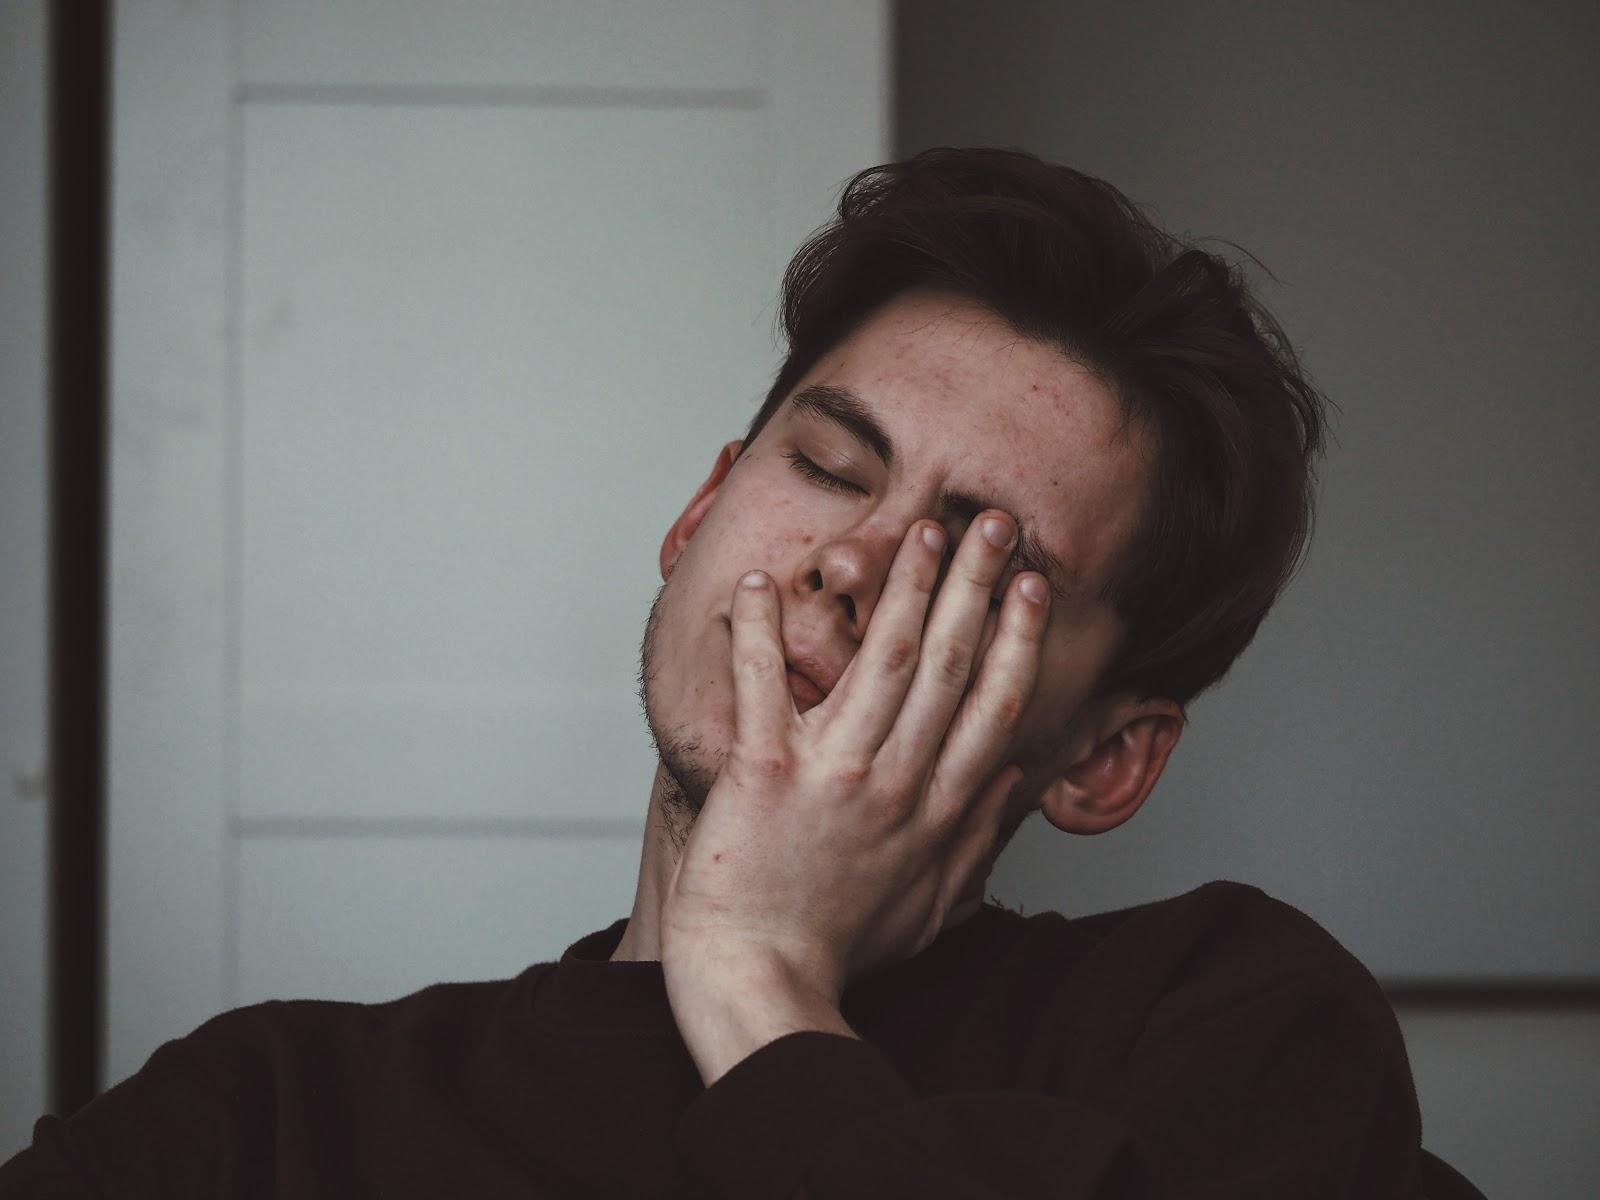 Pushing people away psychology (Why)